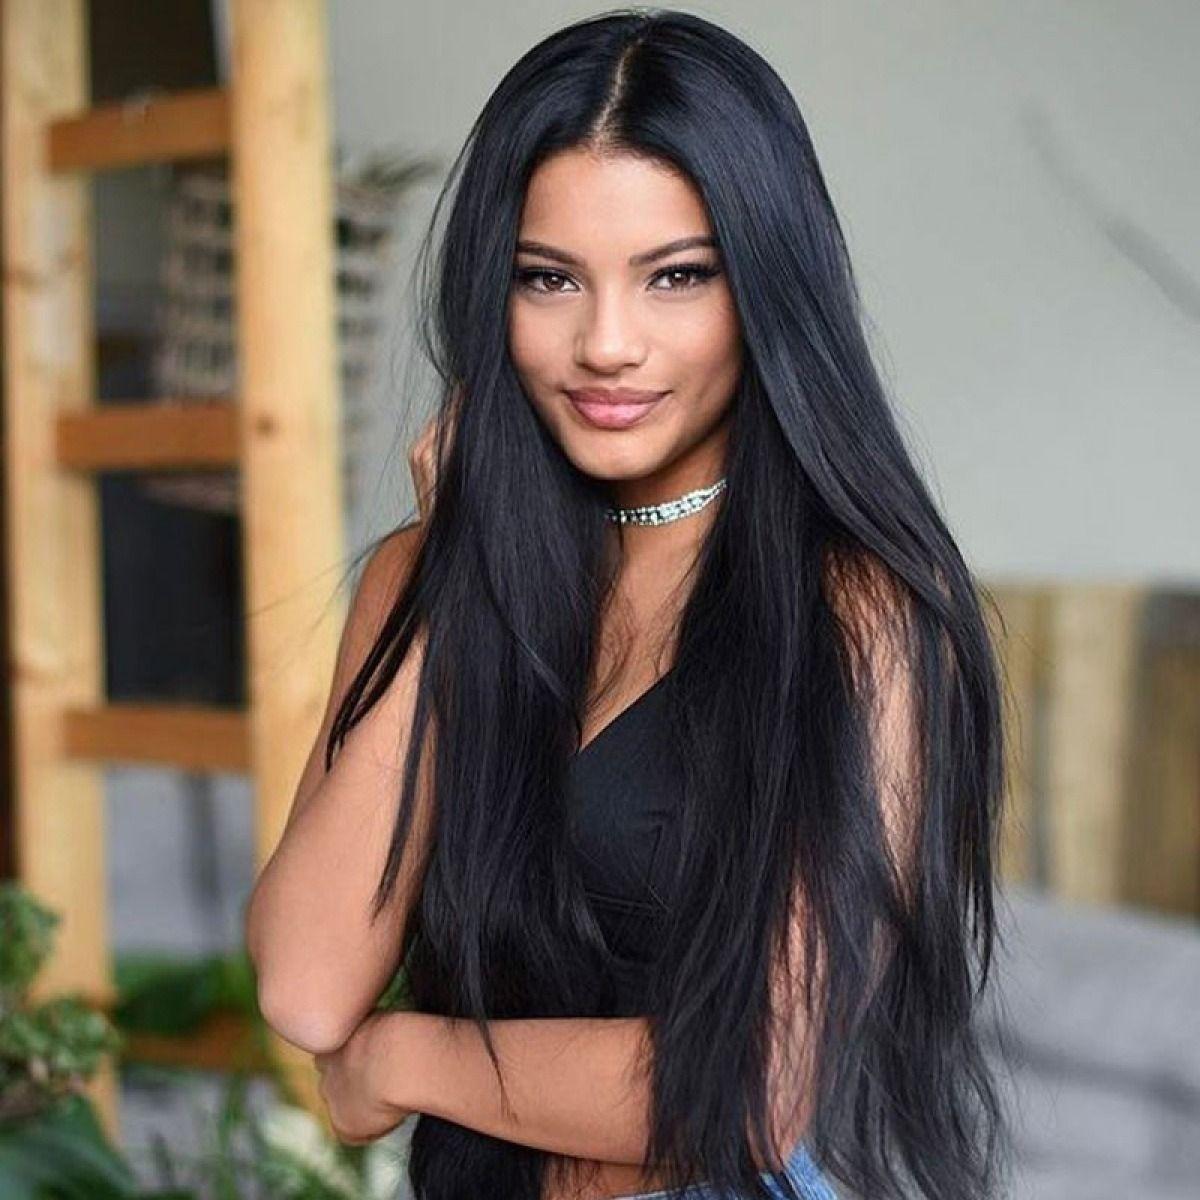 Long Straight Hair Natural Black Remy Human Hair Pre Plucked With Baby Hair 360 Lace Frontal Wigs Gerade Frisuren Perucke Frisuren Glatte Schwarze Haare